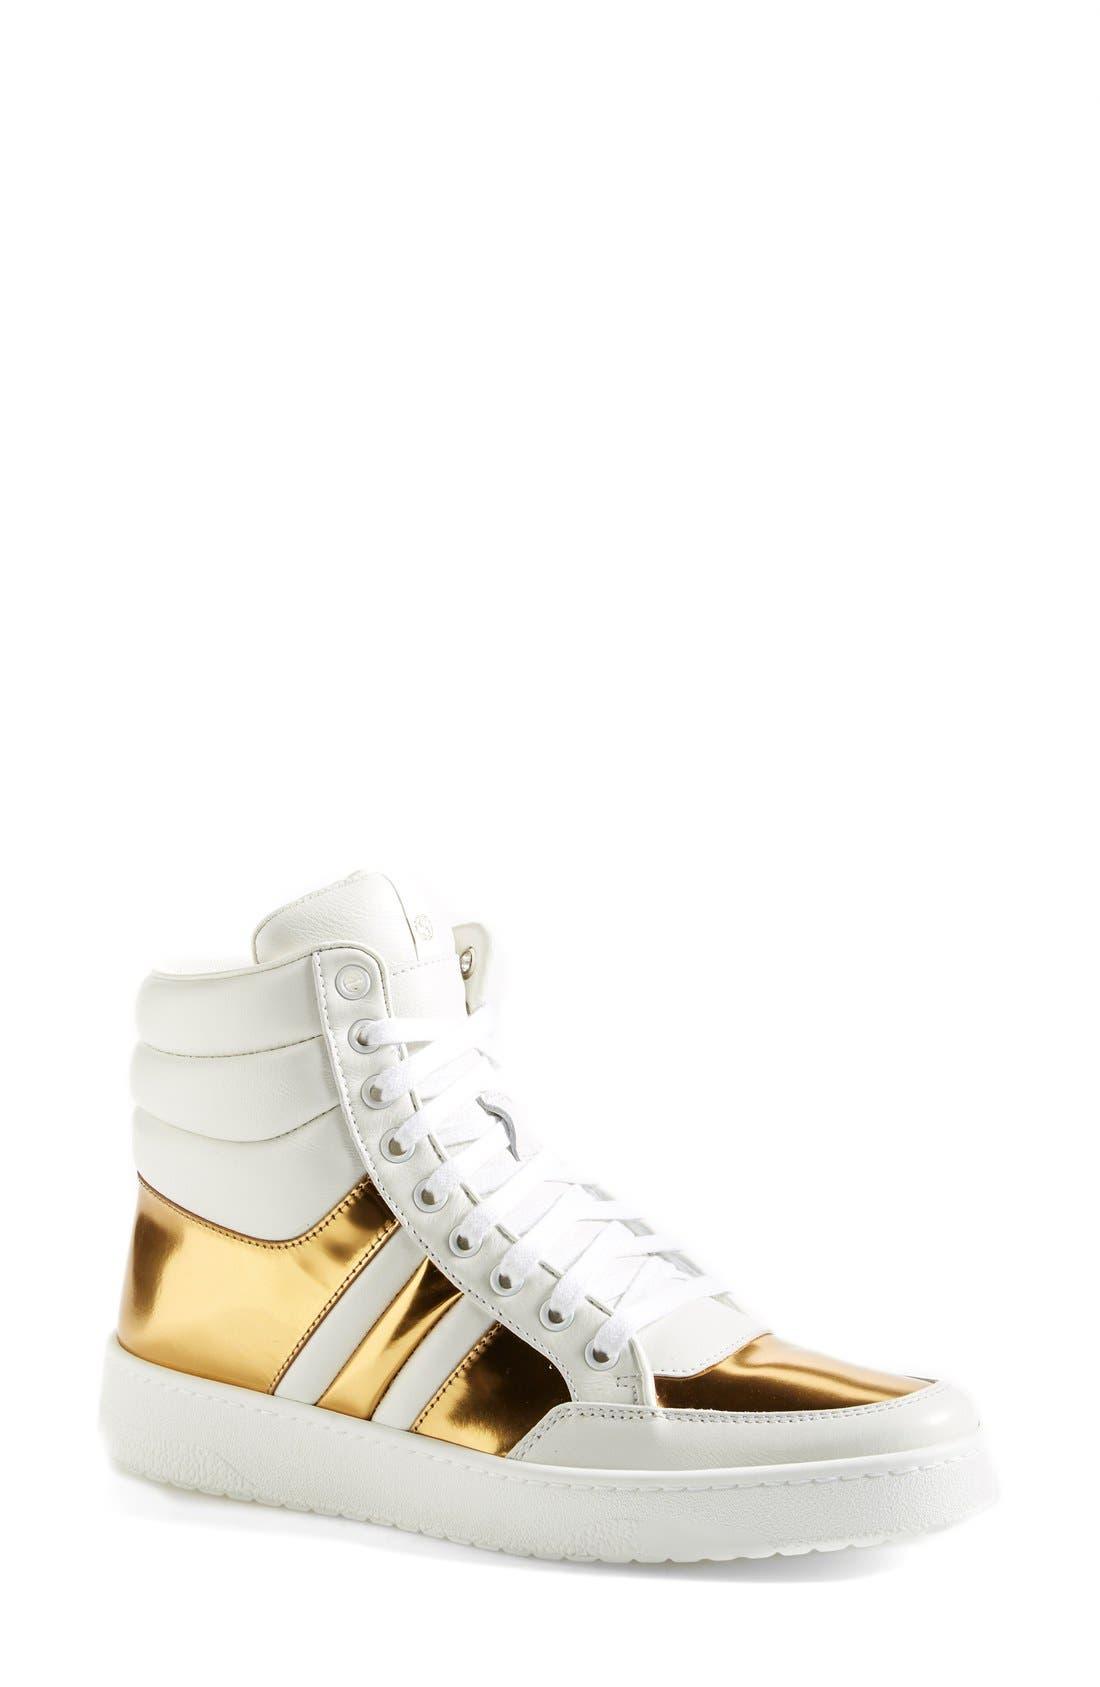 Main Image - Gucci 'Ronnie' High Top Sneaker (Women)